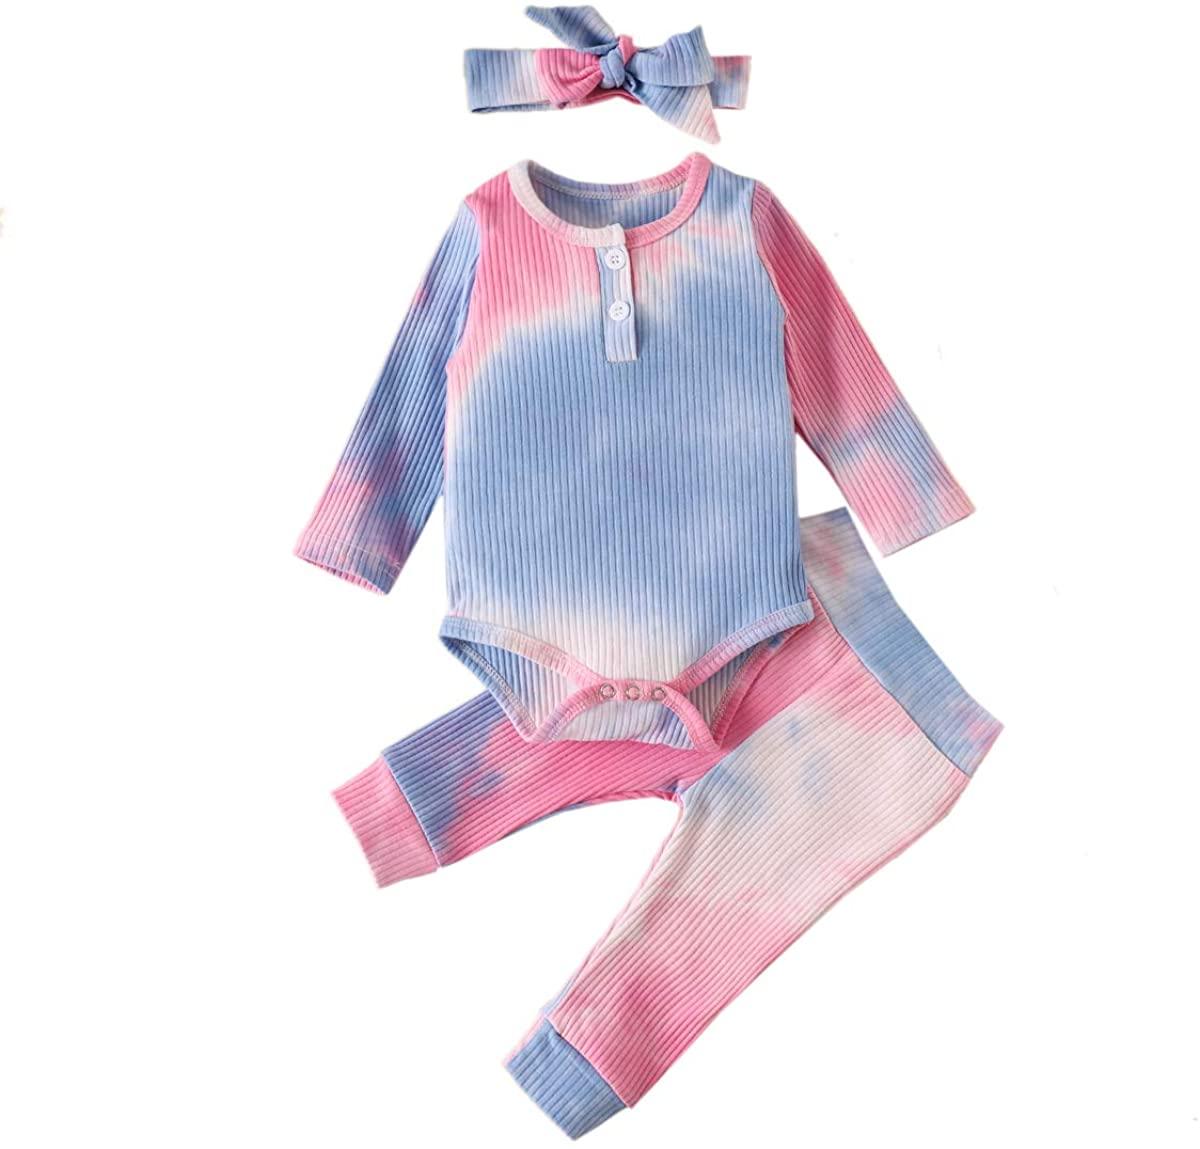 Unisex Baby Pajamas Baby Boy Girl Tie Dye Clothes Long Sleeve Romper Bodysuit Tops Pants Headband Set